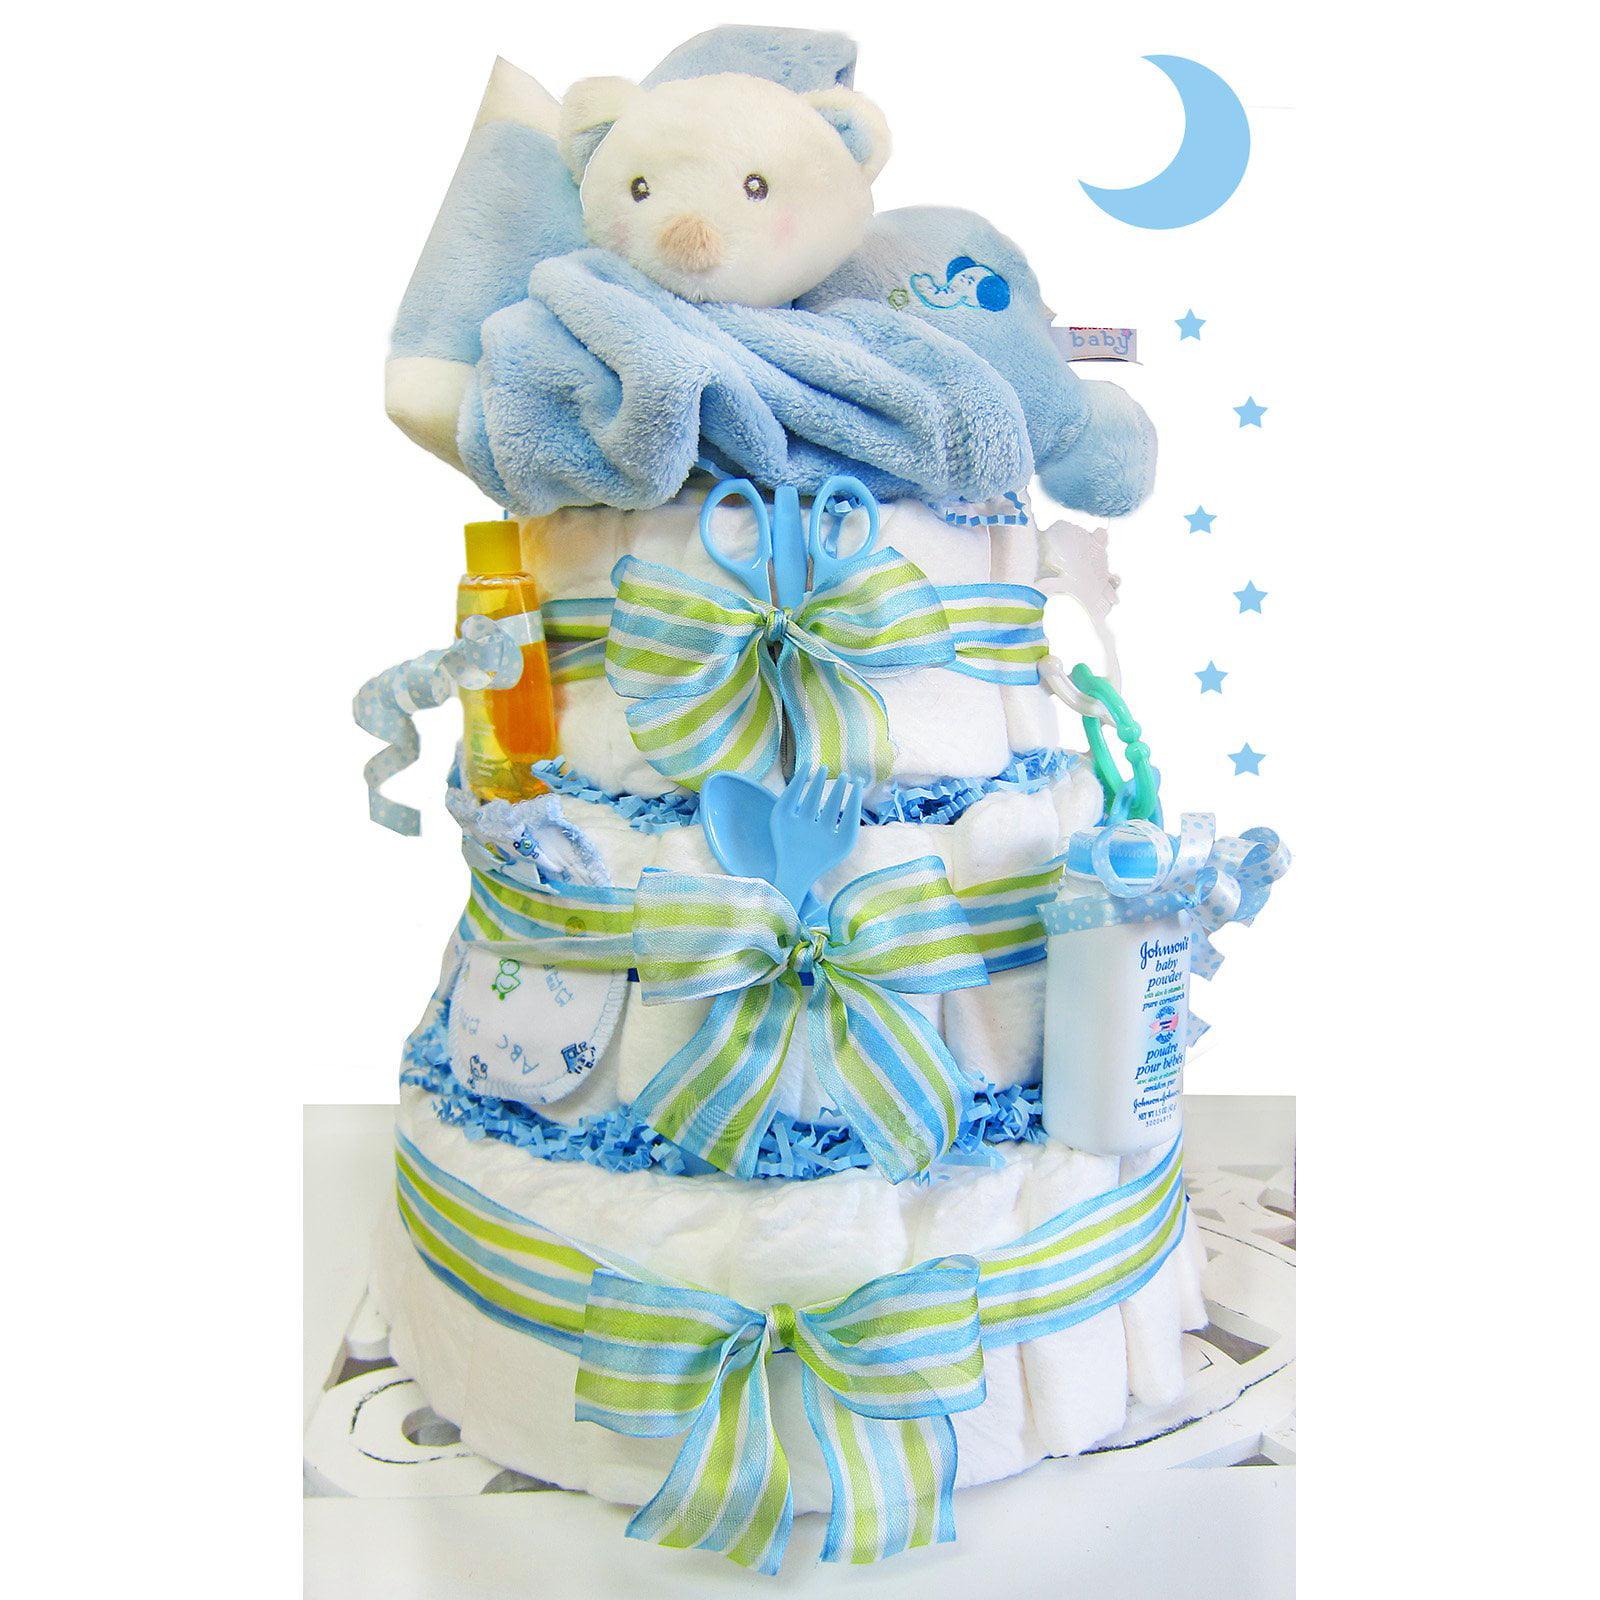 Sleepy Bear 3 Tier Diaper Cake - Boy